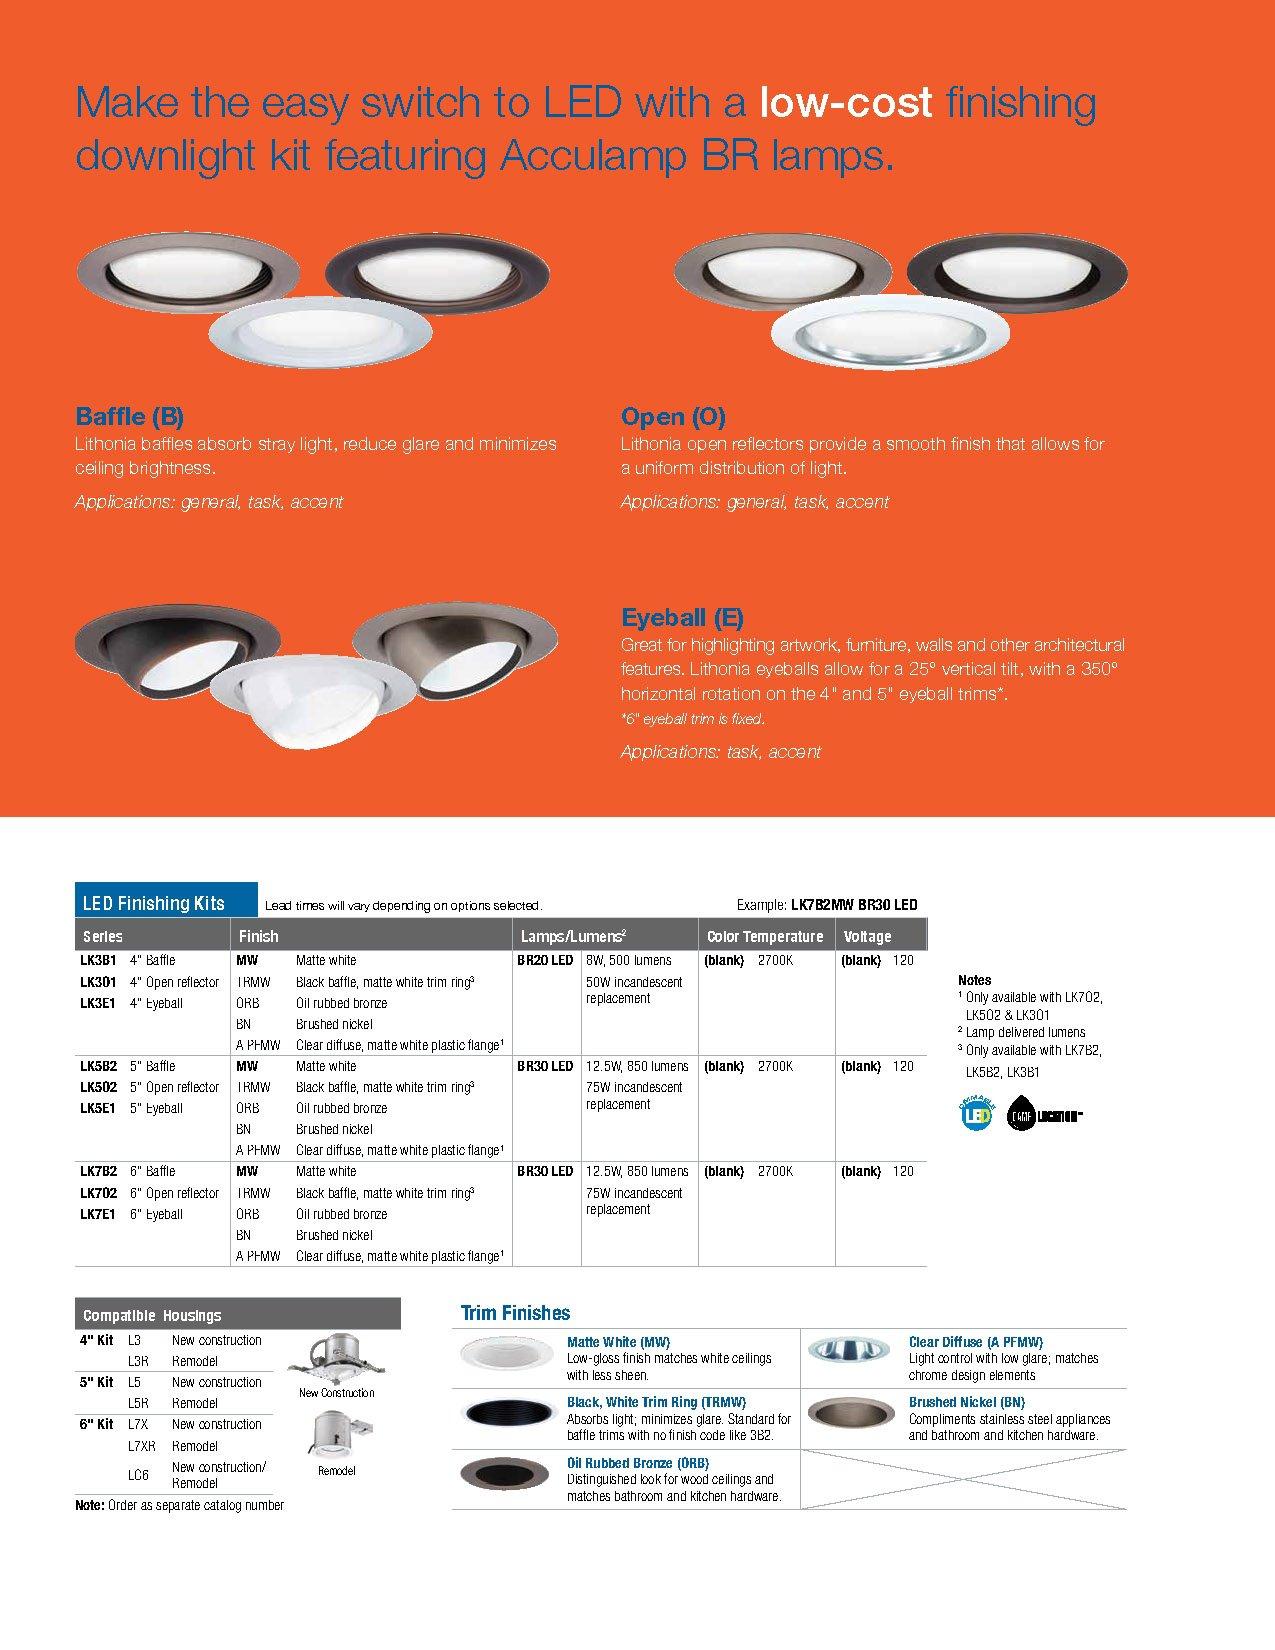 Lithonia Lighting LK5GMW LED M4 Gimbal Kit with Integrated Led, White, 5 inch by Lithonia Lighting (Image #4)